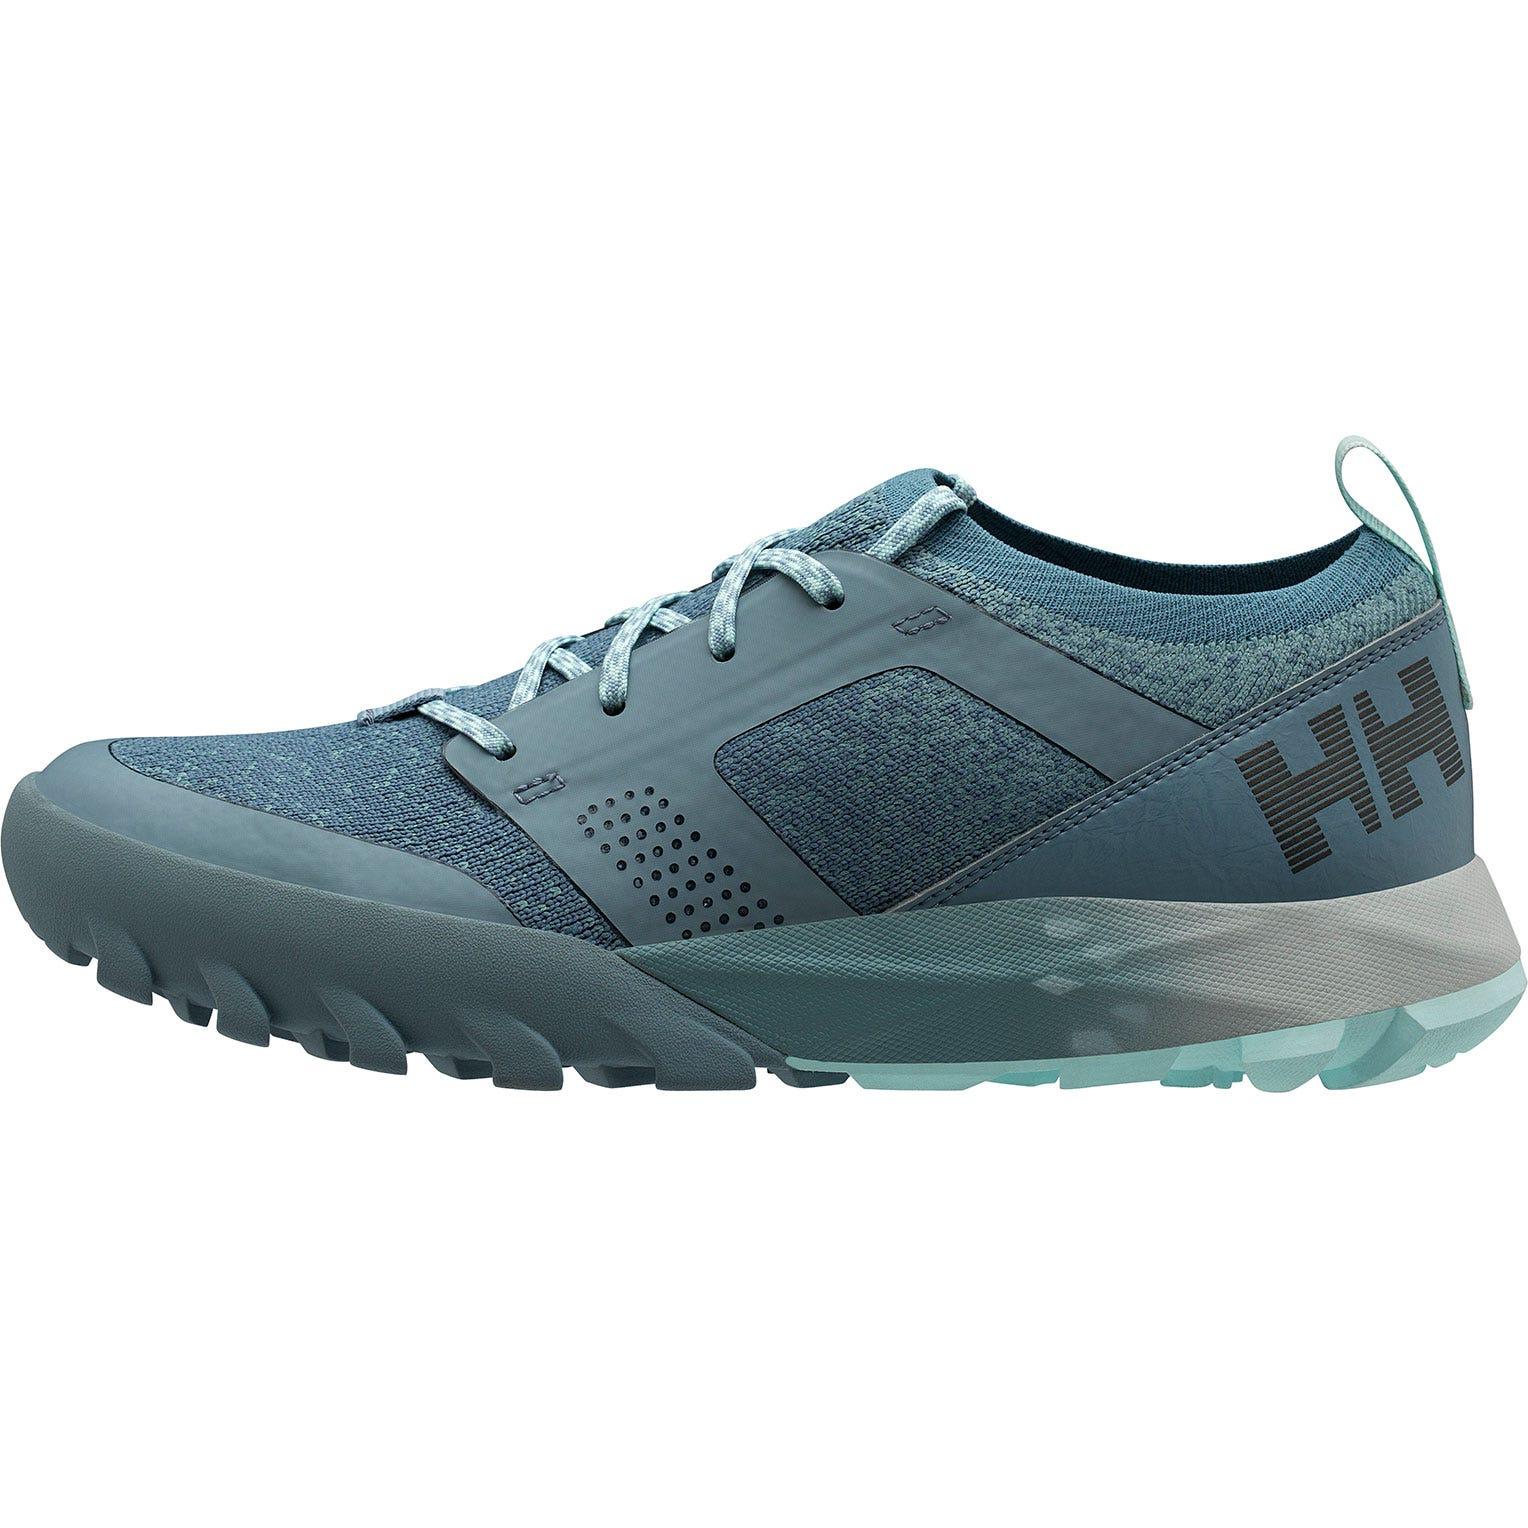 Helly Hansen W Loke Dash Womens Hiking Boot Blue 39.3/8